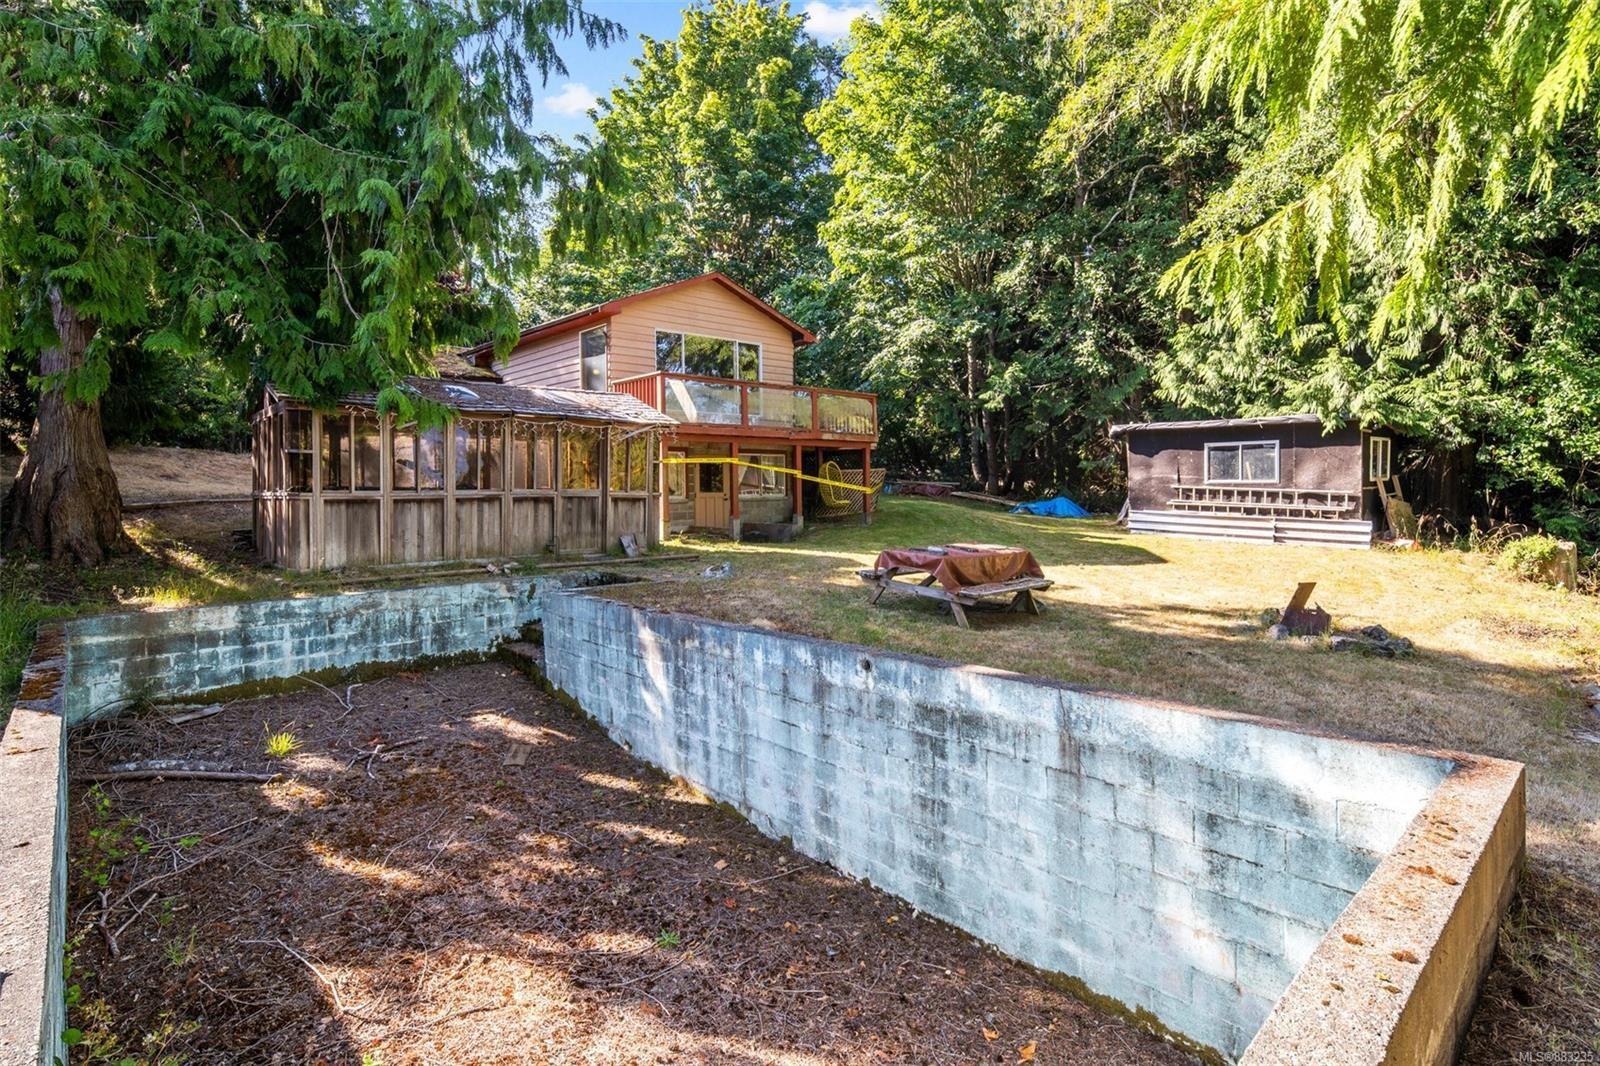 Photo 13: Photos: 6542 Thornett Rd in : Sk East Sooke House for sale (Sooke)  : MLS®# 883235